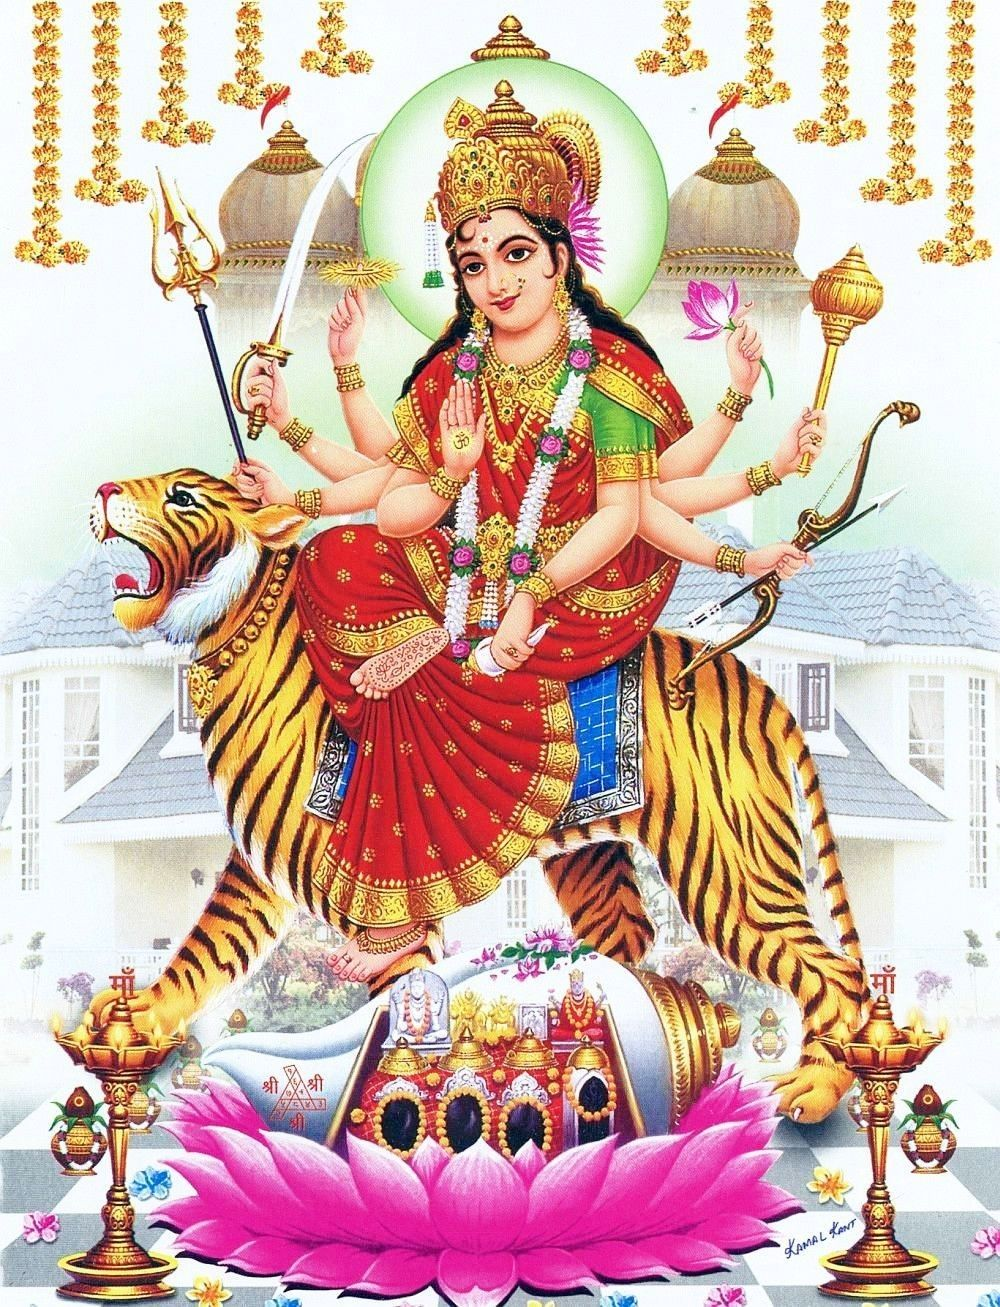 Pin By Yogendra Sharma Wishu On Jai Maa Durge Durga Kali Durga Goddess Navratri Puja